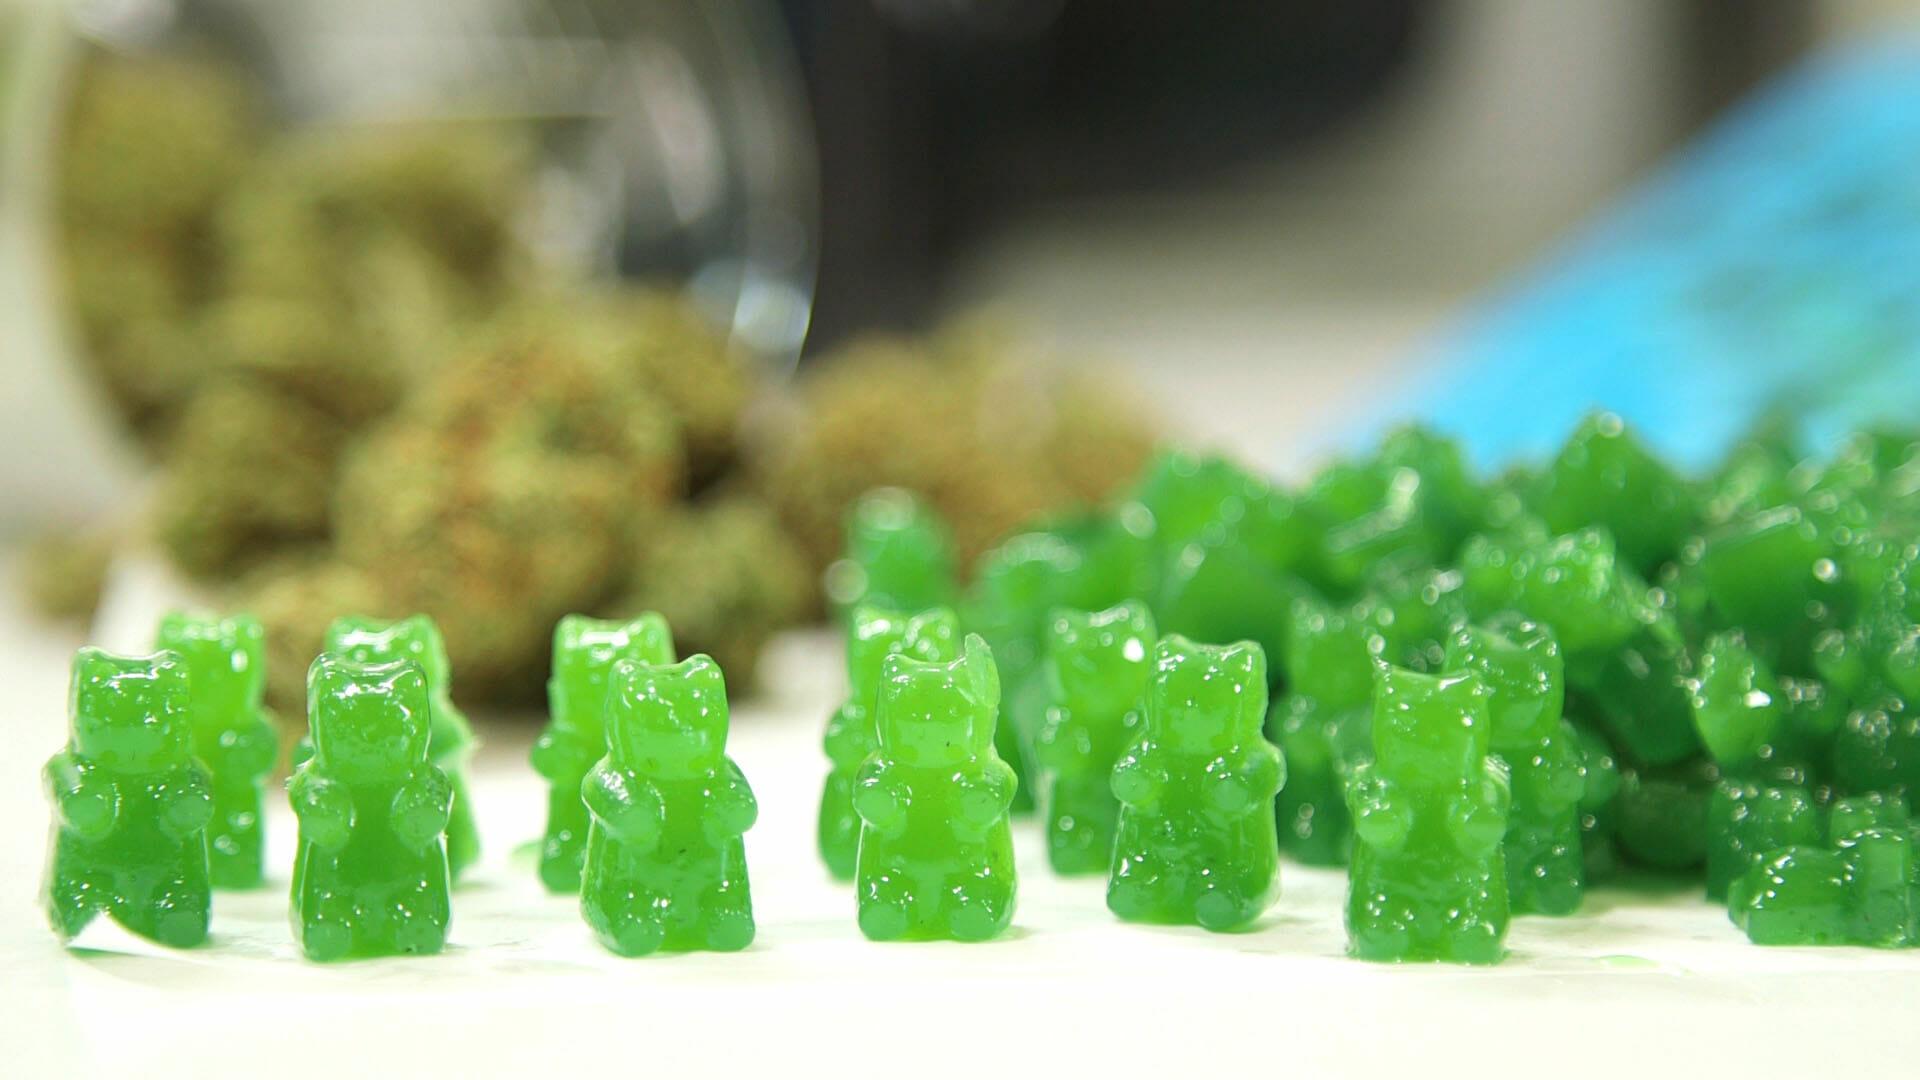 Cannabis Infused Gummies Recipe Coconut Oil Infused Eats